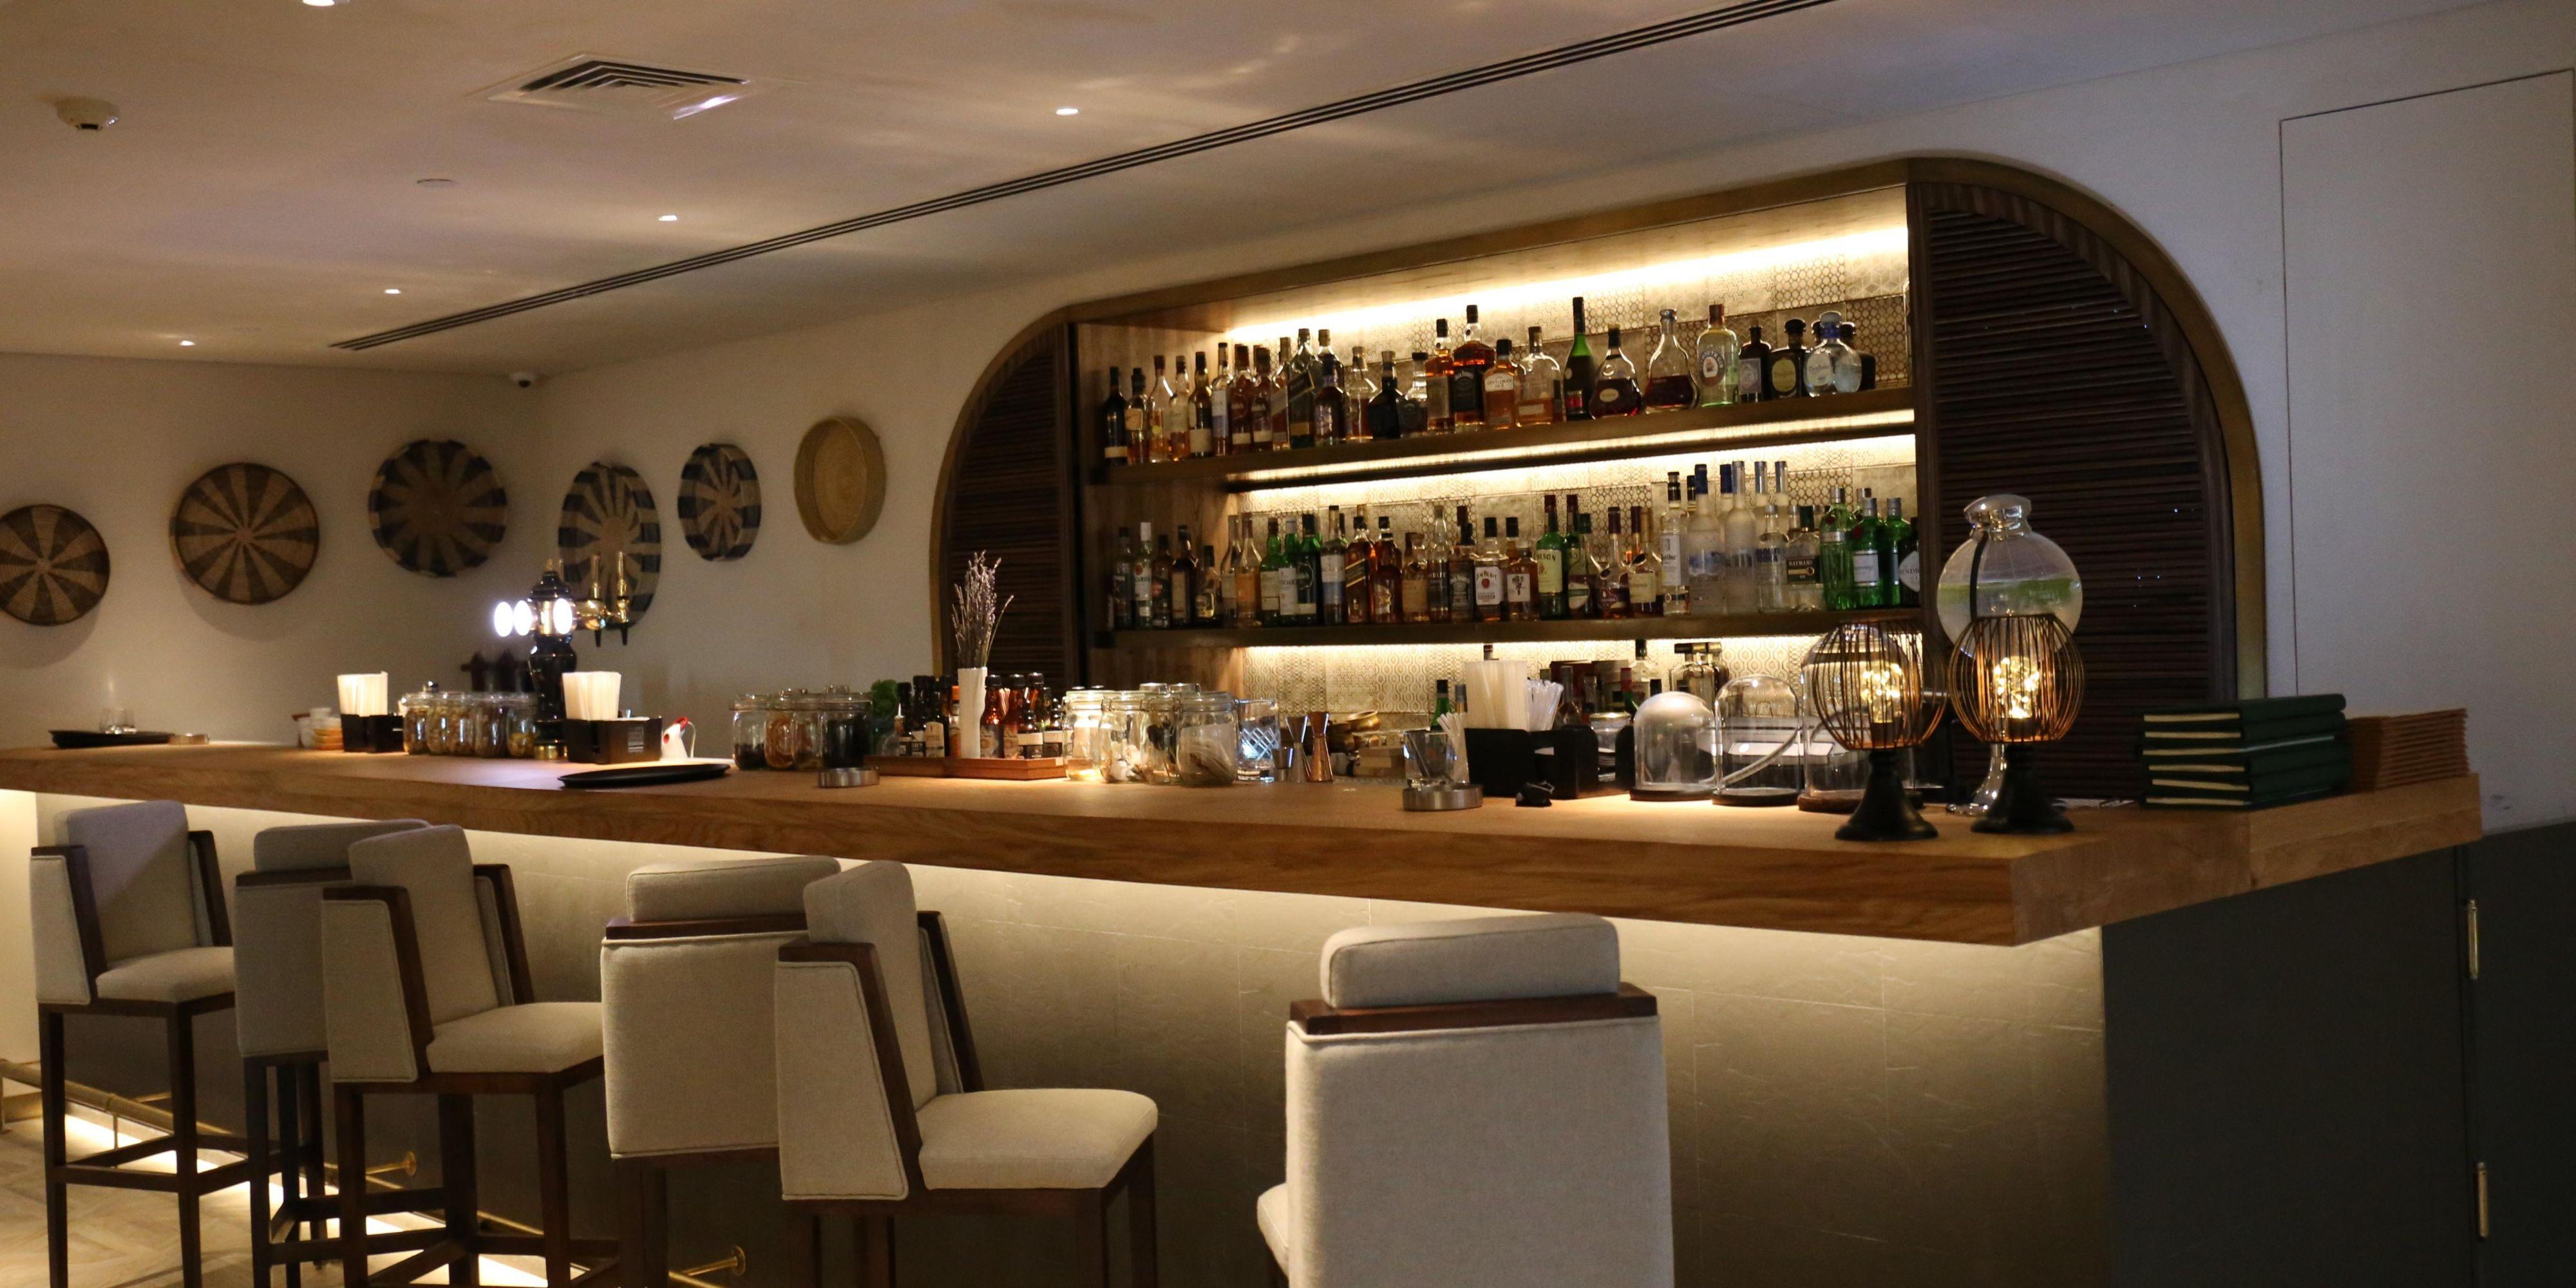 Tresind, Indian modernist cuisine, voco Dubai, Sheikh Zayed Road